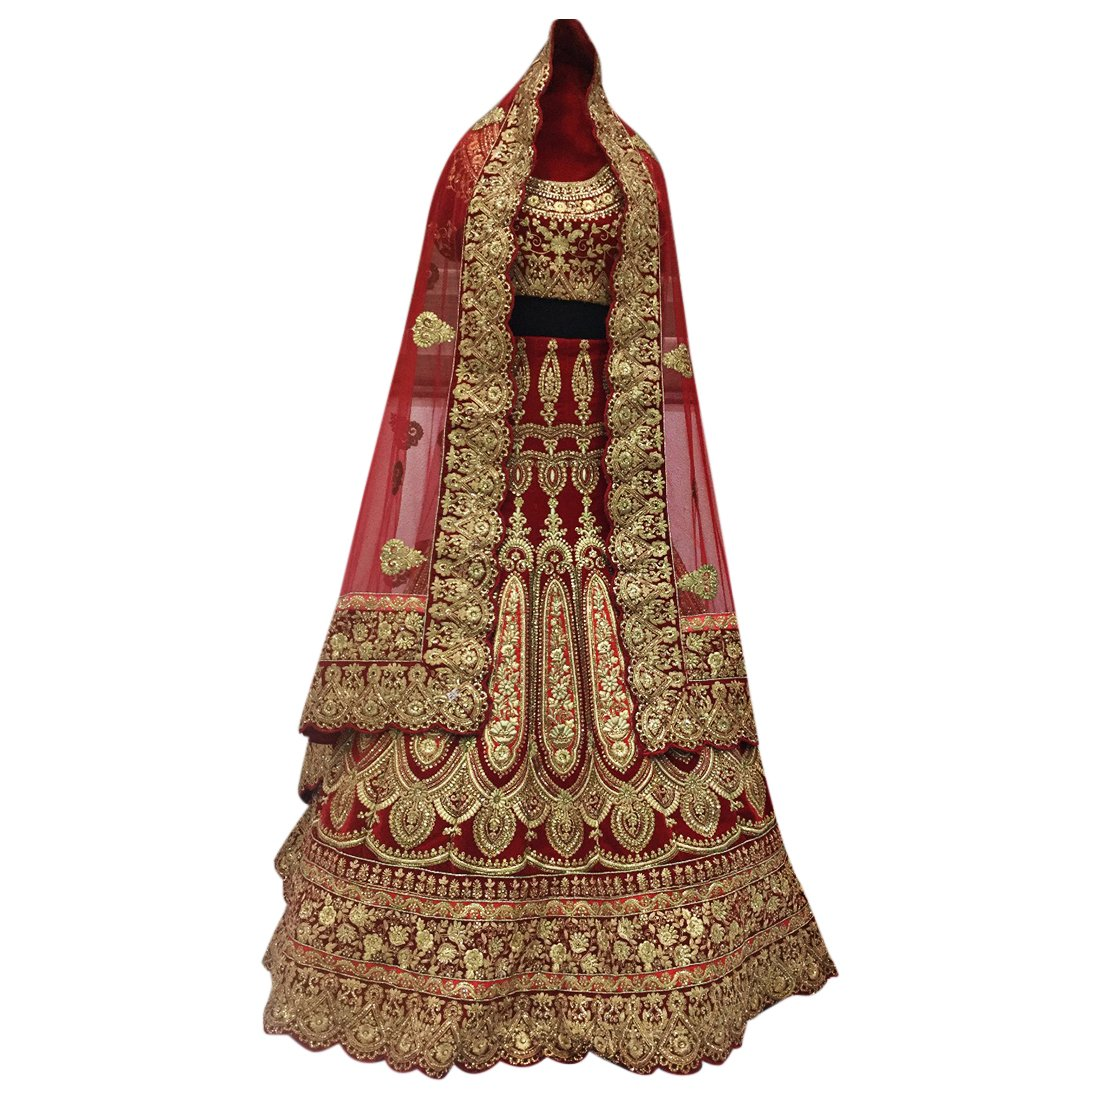 New Designer Collection Ethnic Heavy Indian Bridal Wedding Women Lehenga Choli Anarkali Salwar Chaniya Choli By Balaji Emporium 608 4